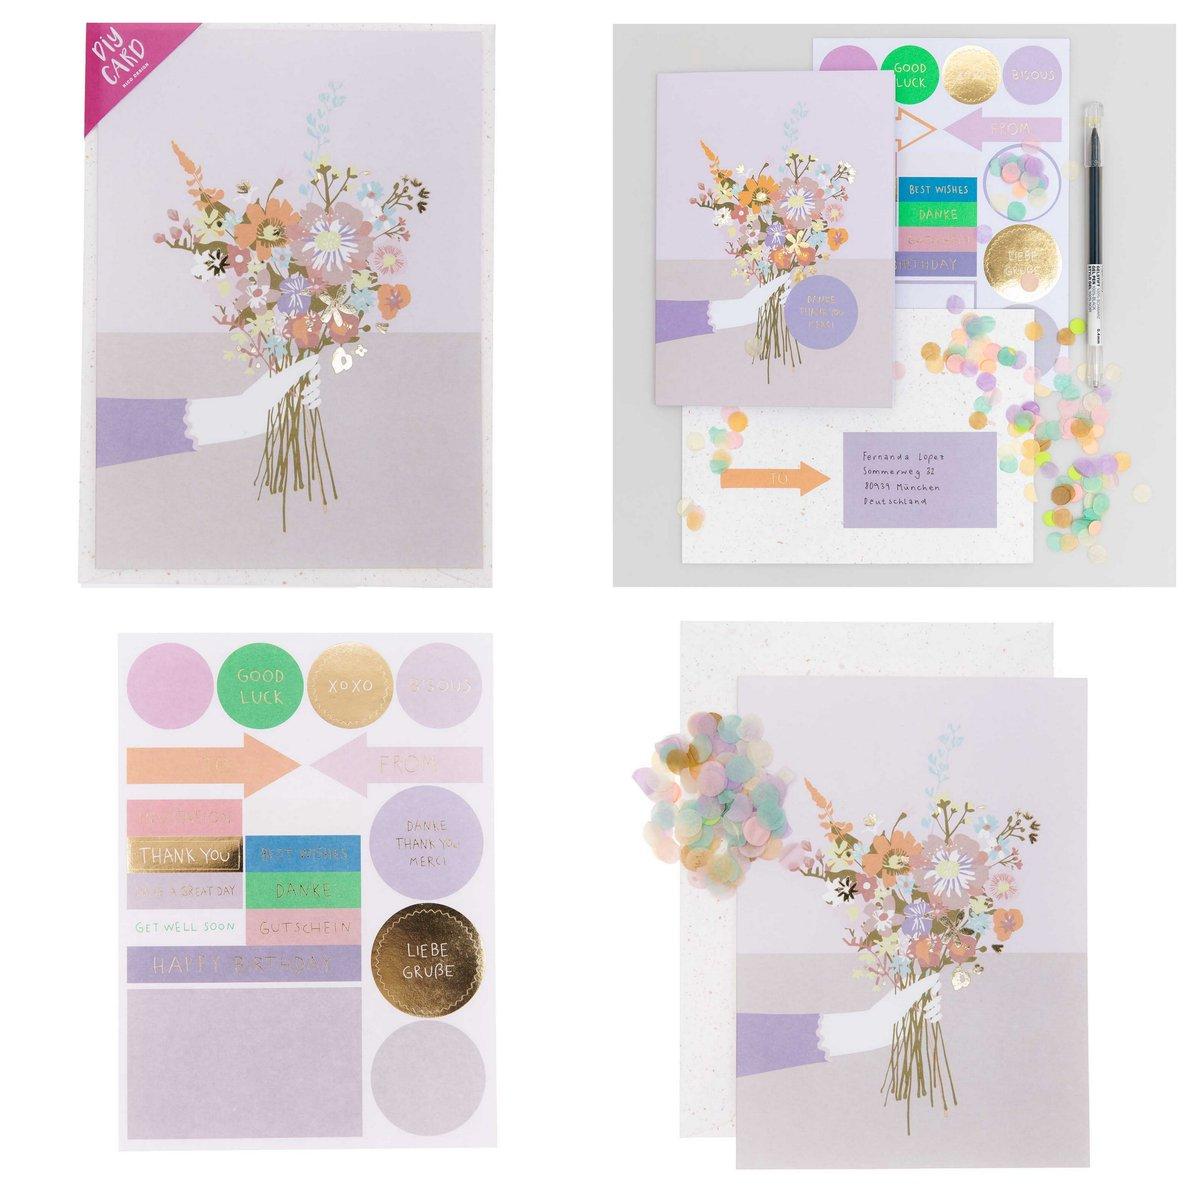 Image of DIY Greeting Cards